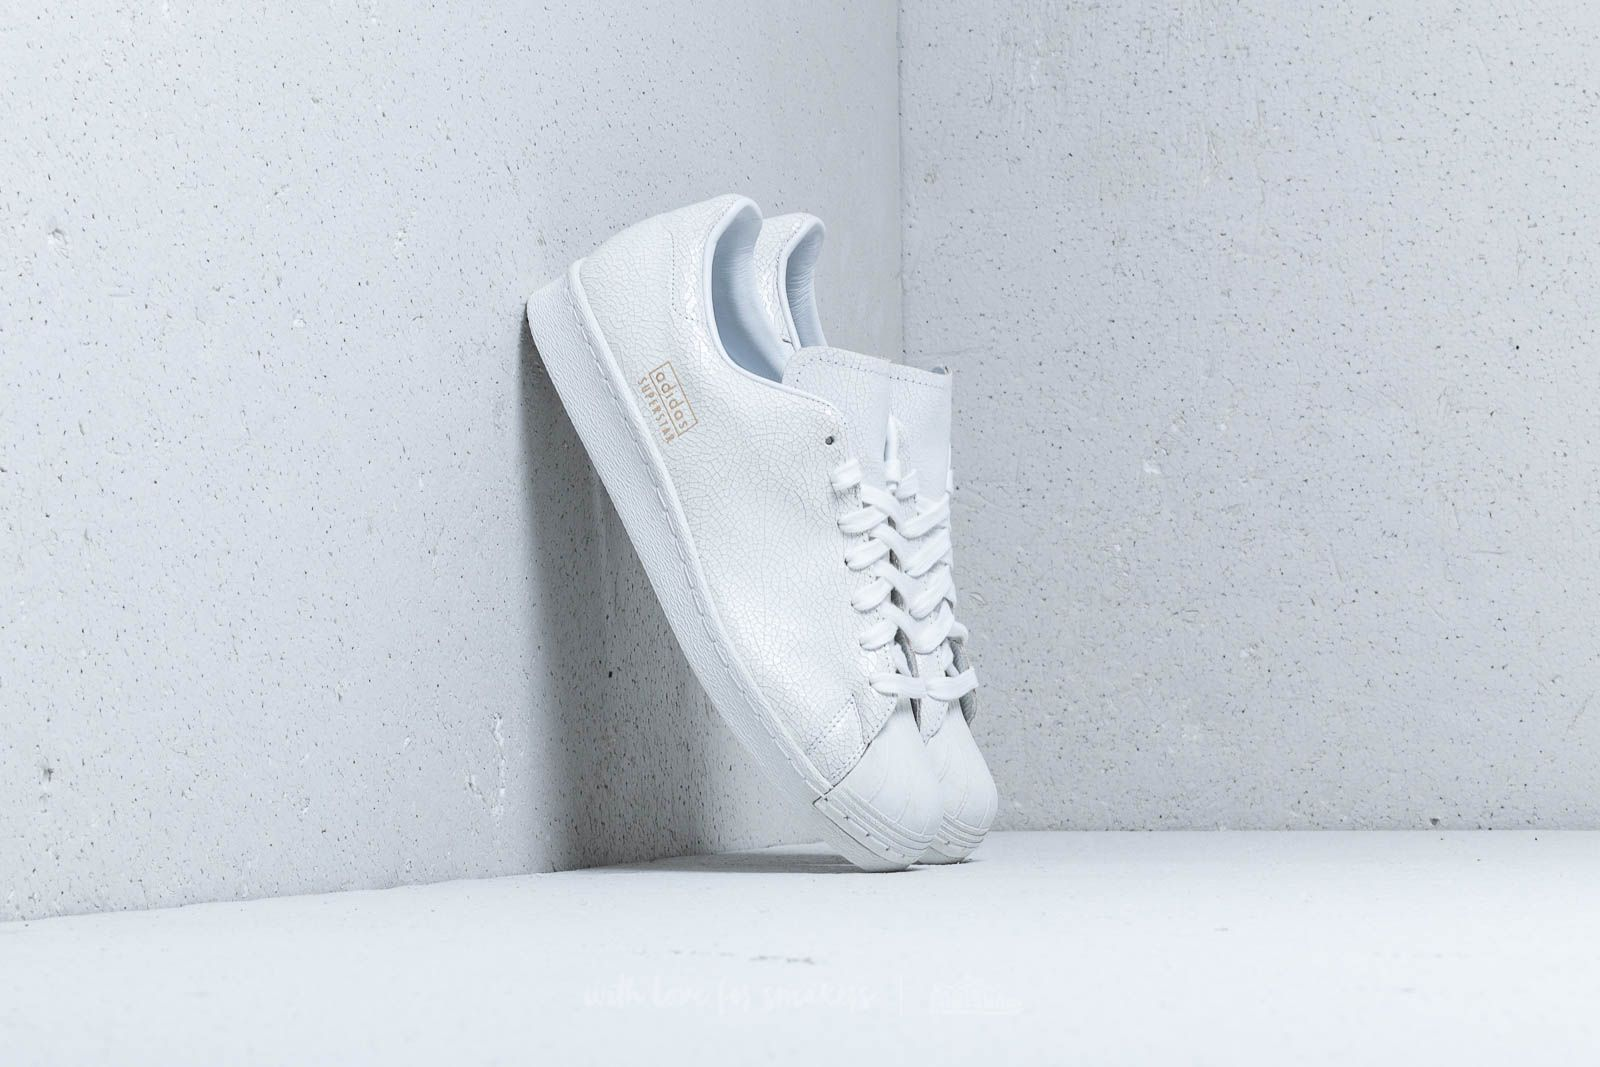 Adidas Superstar 80s Clean Ftw White/ Ftw White/ Gold